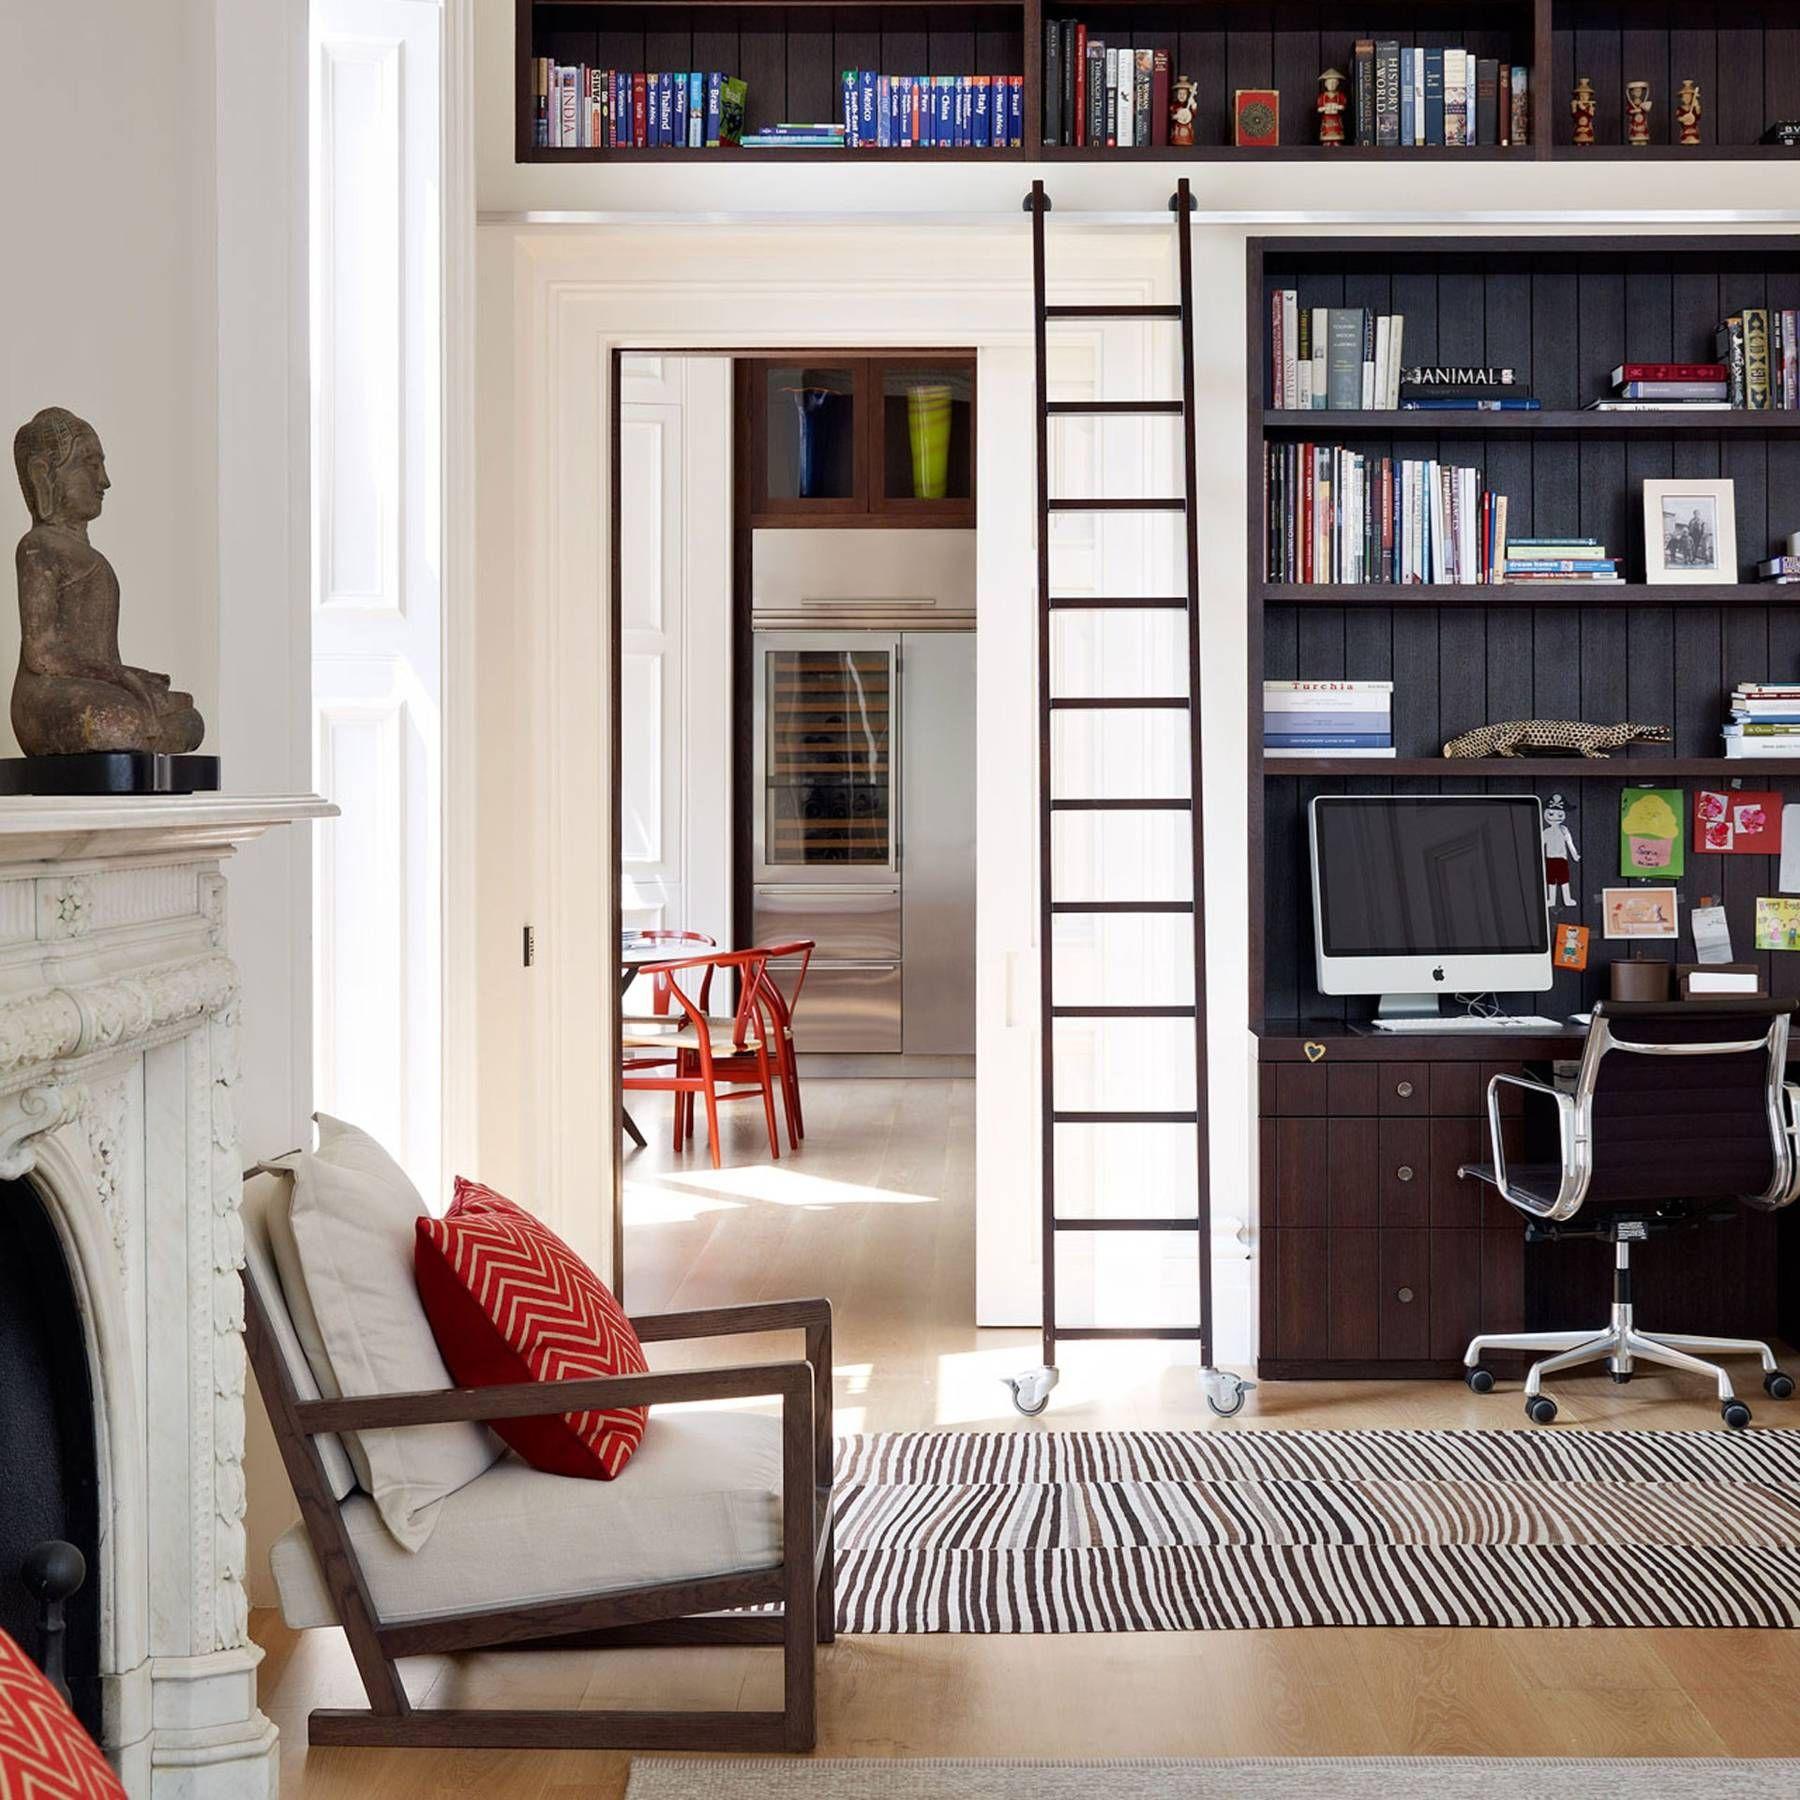 Bookcase ideas bookshelf ideas living room bookcase home